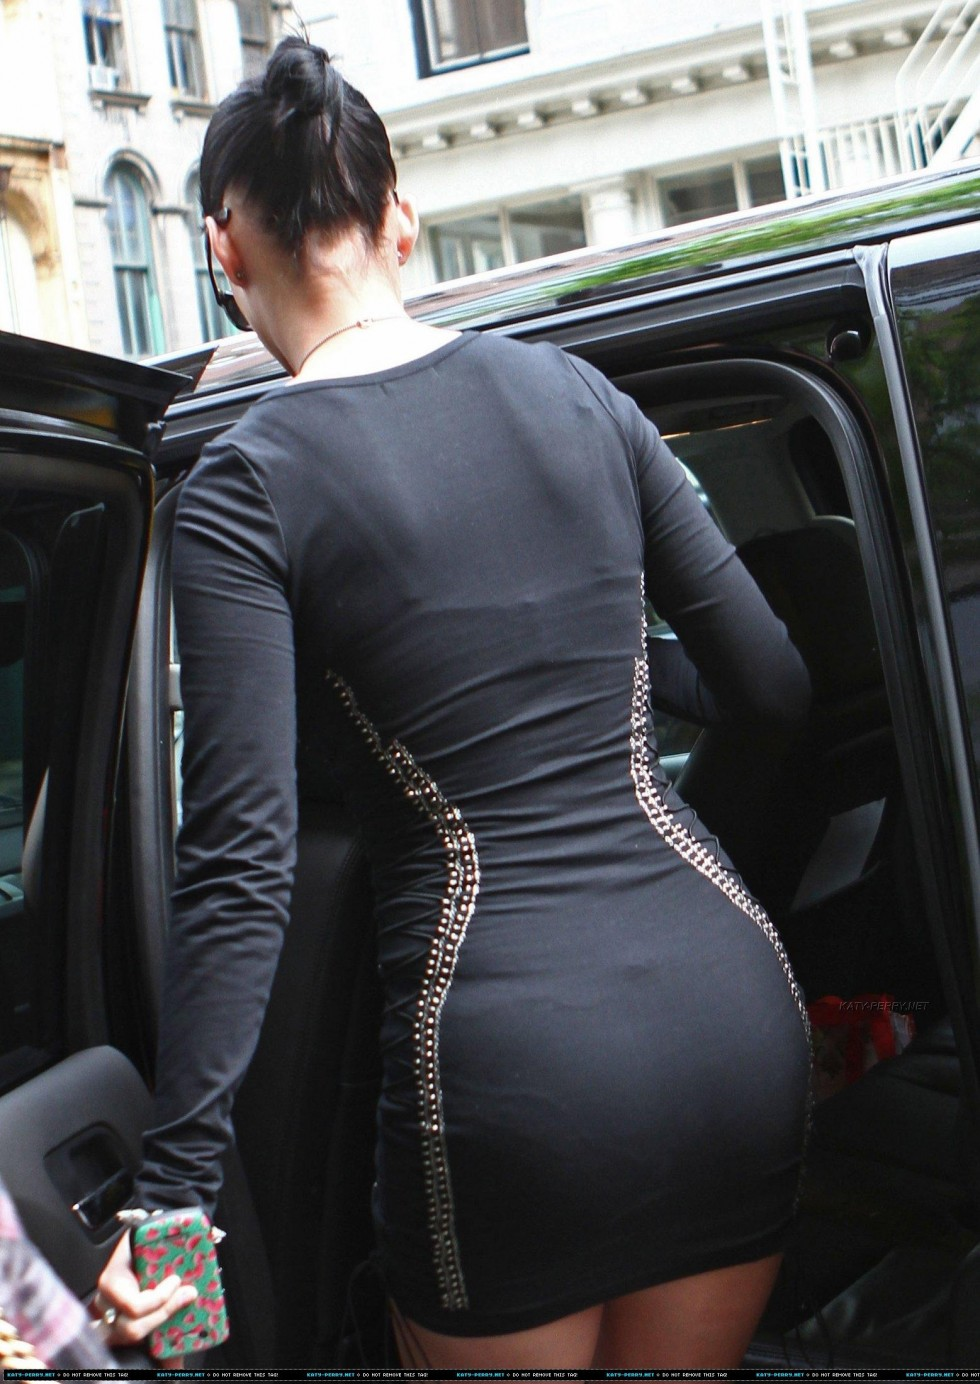 Katy Perry 2010 : katy-perry-leggy-in-black-dress-04